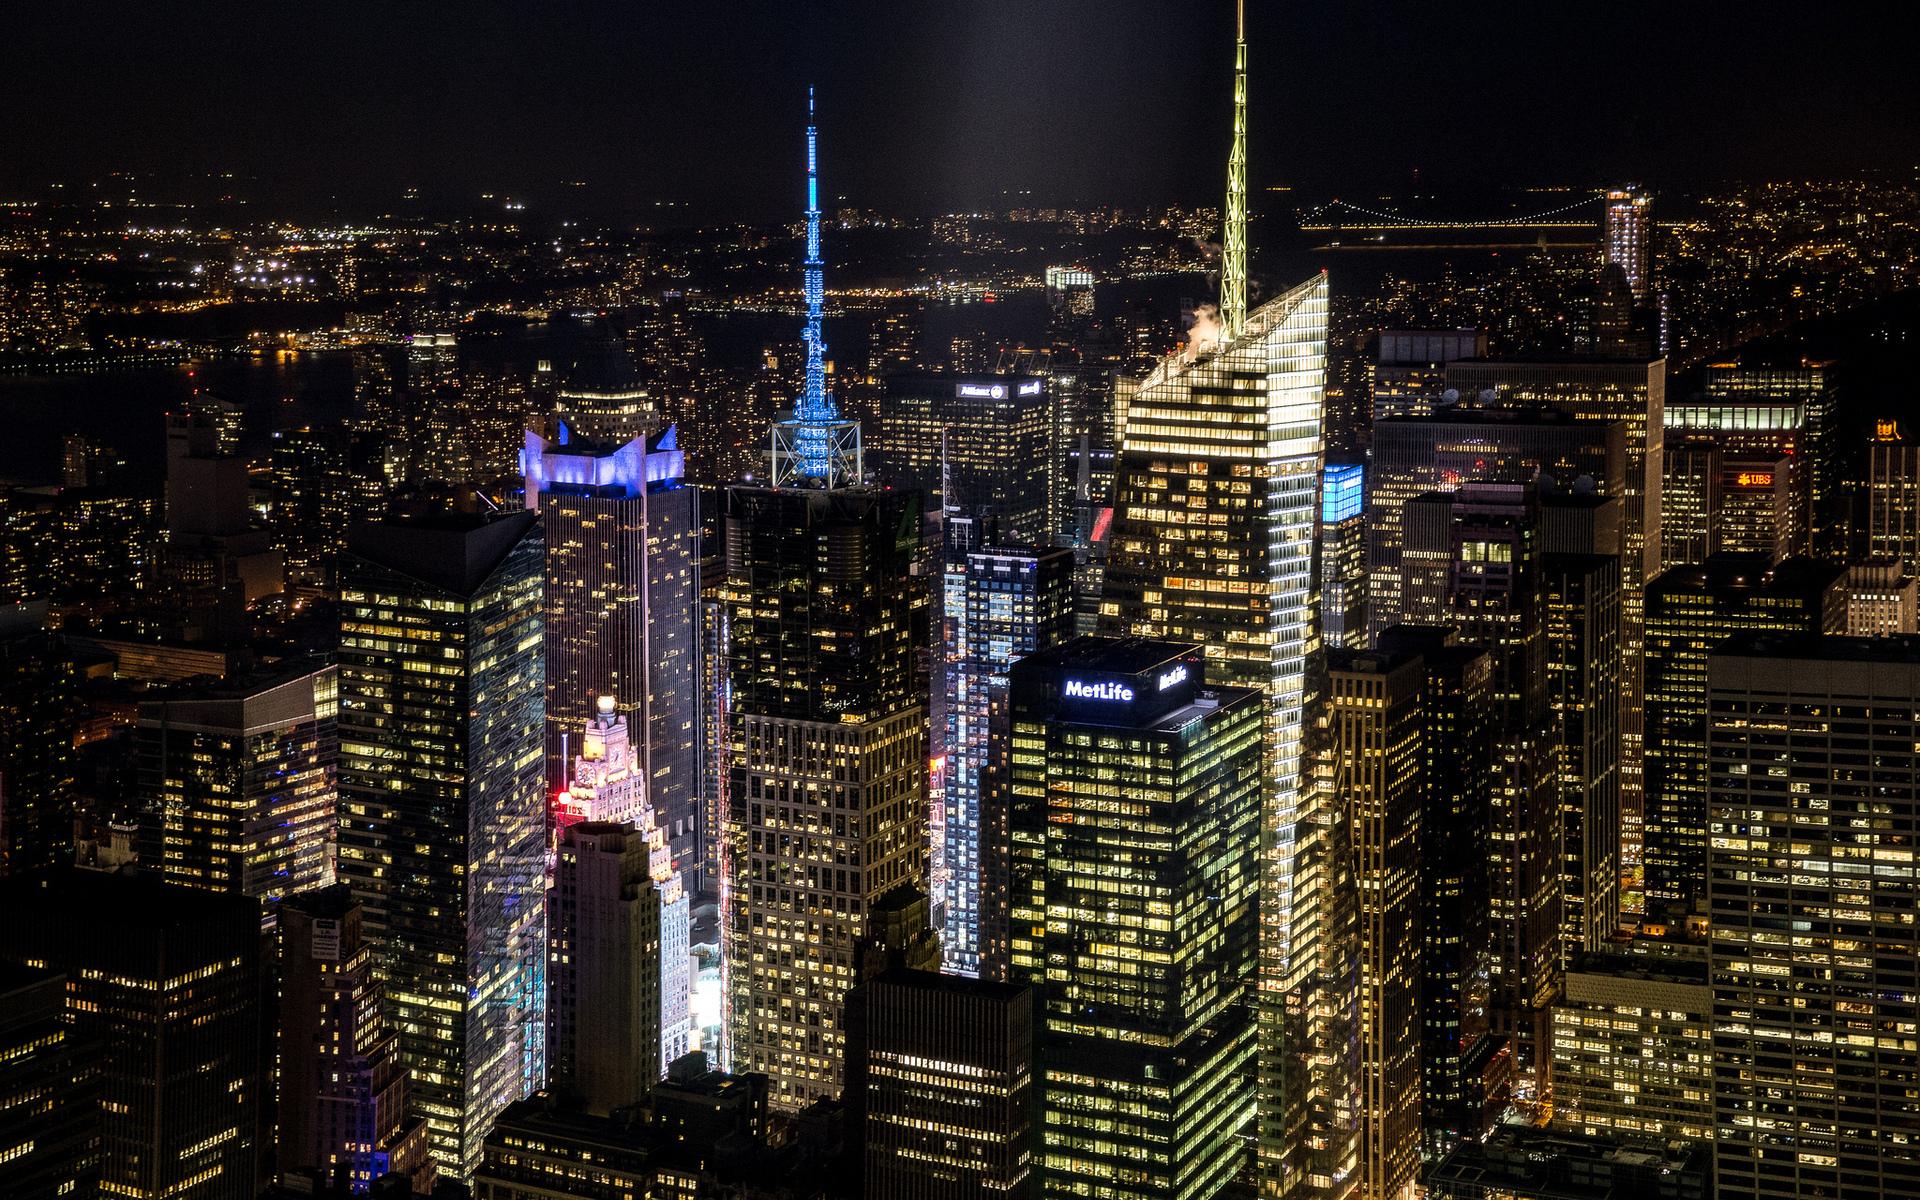 Photo Wallpaper Light, Night, The City, Building, Home, - New York City - HD Wallpaper